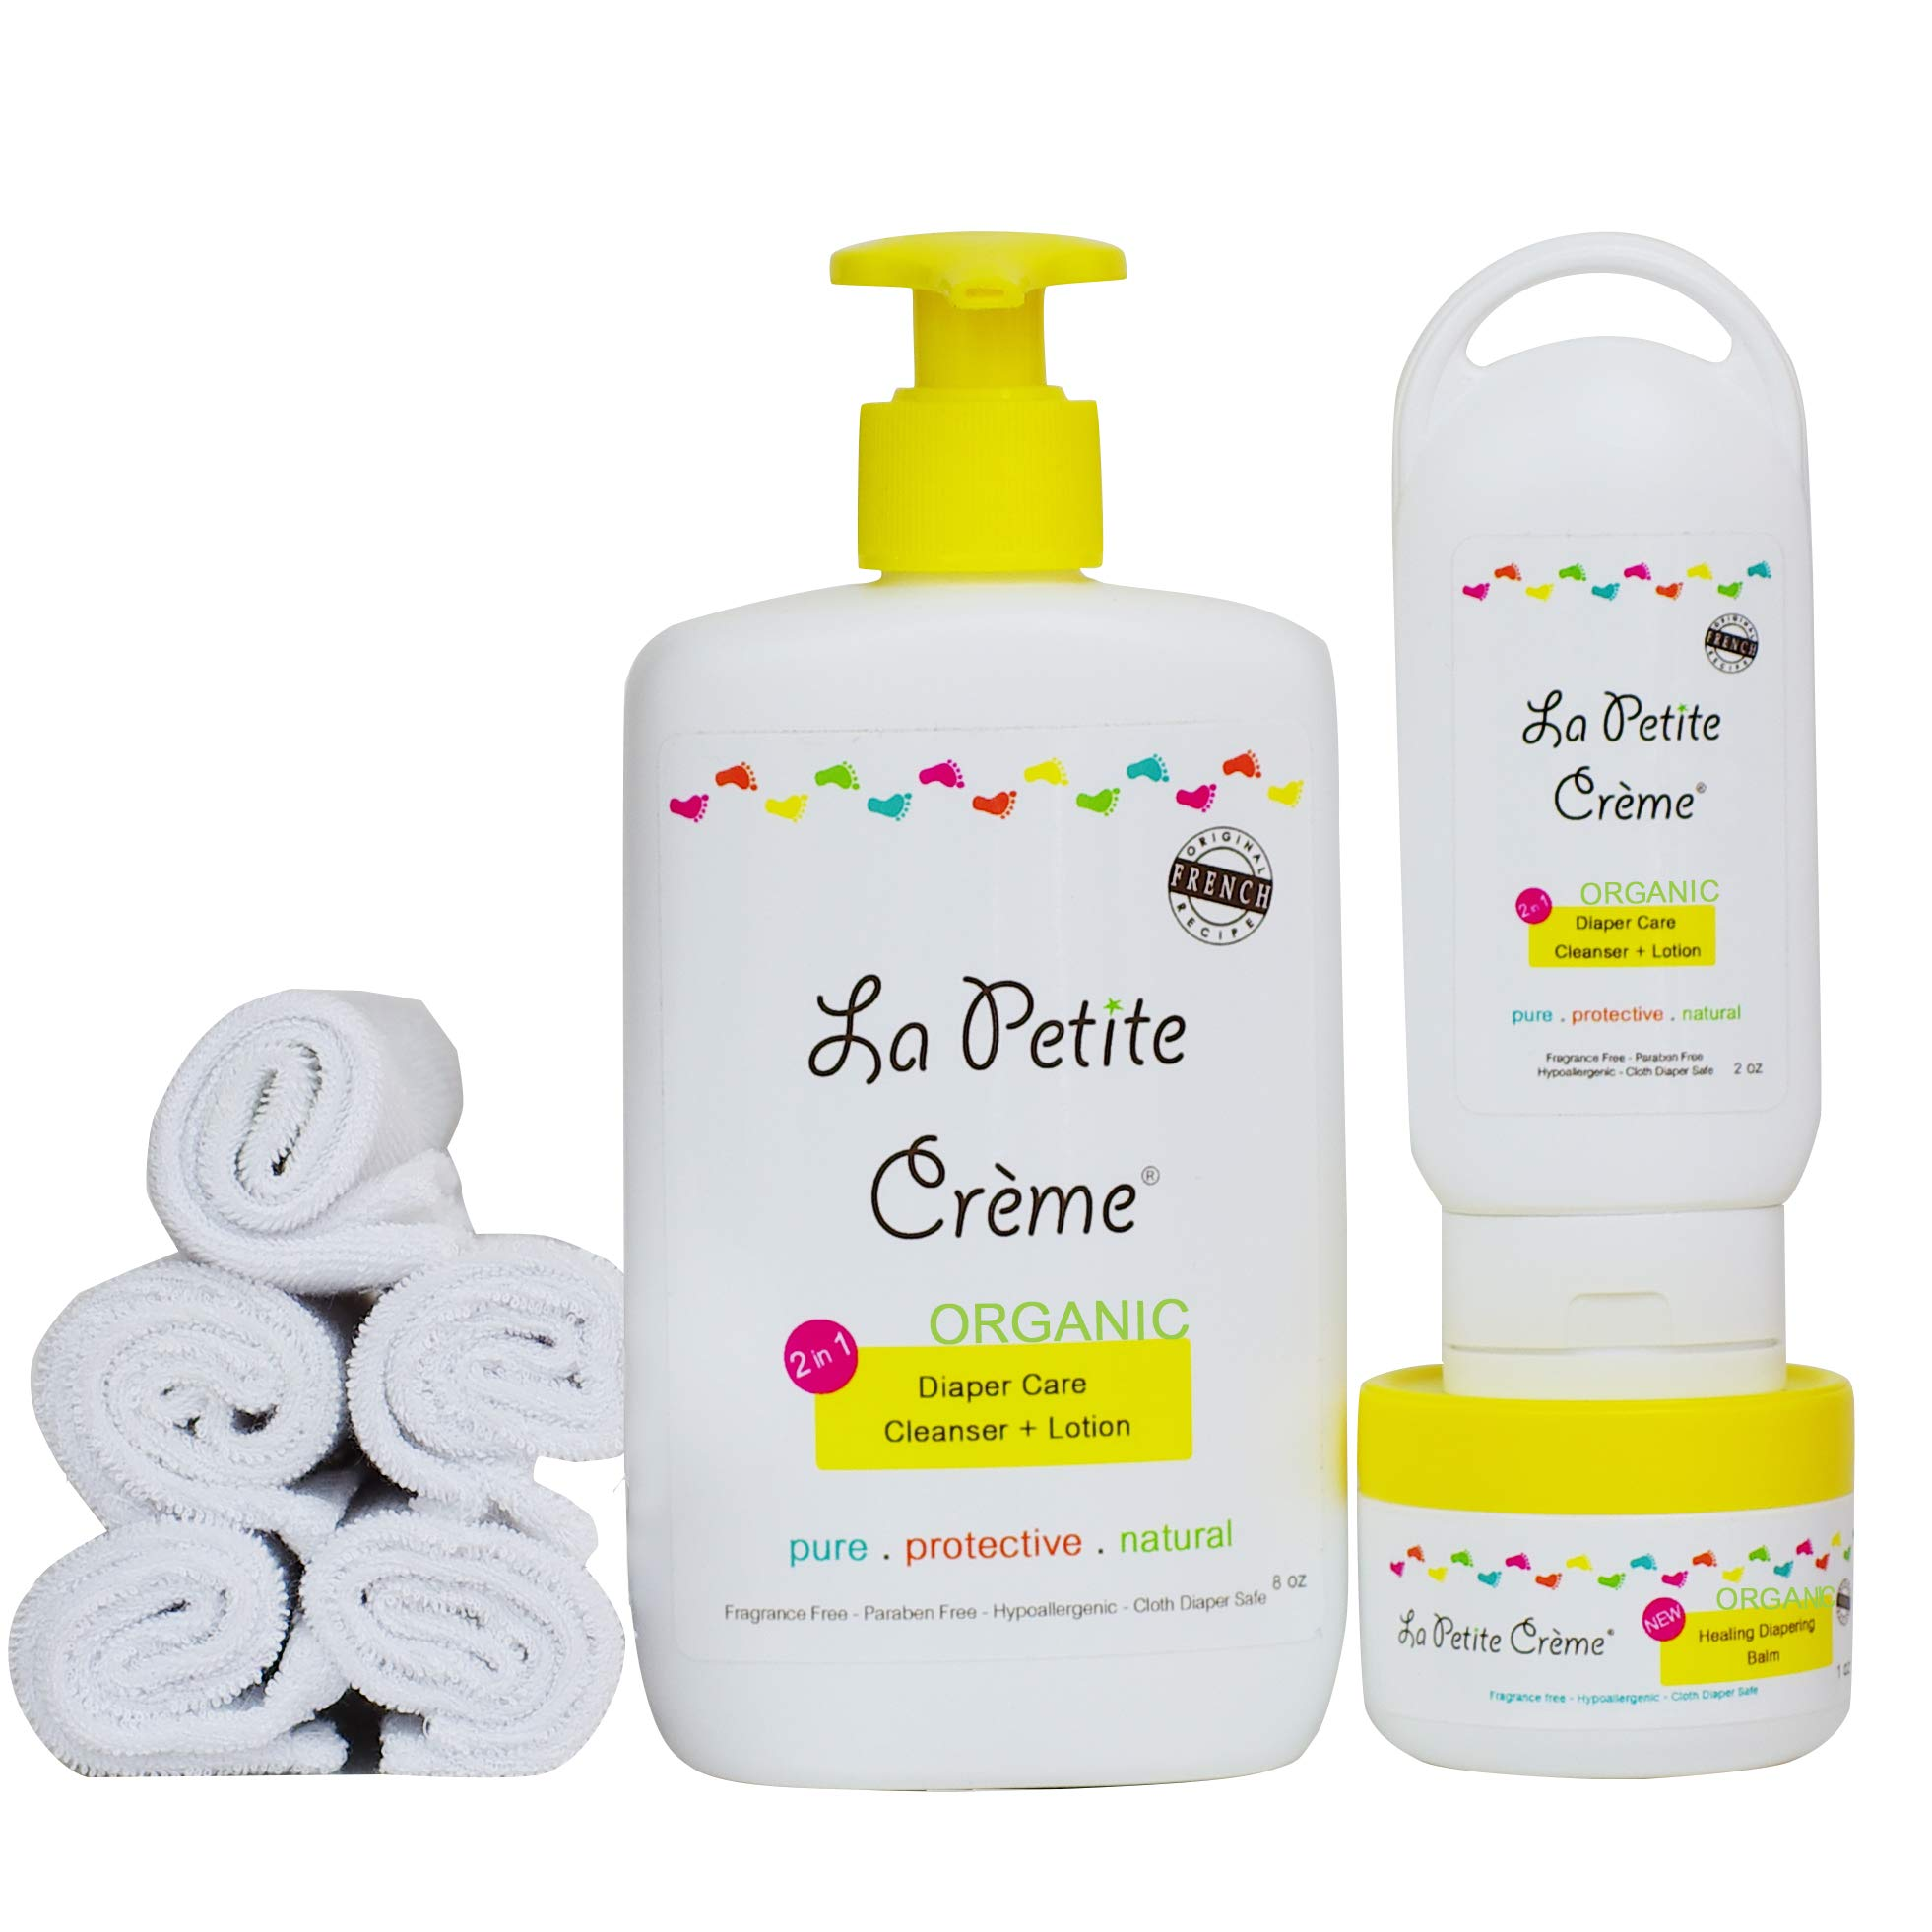 La Petite Creme - Organic French Diapering (Baby Shower Bundle (Reusable)) - USDA Certified Organic by La Petite Creme